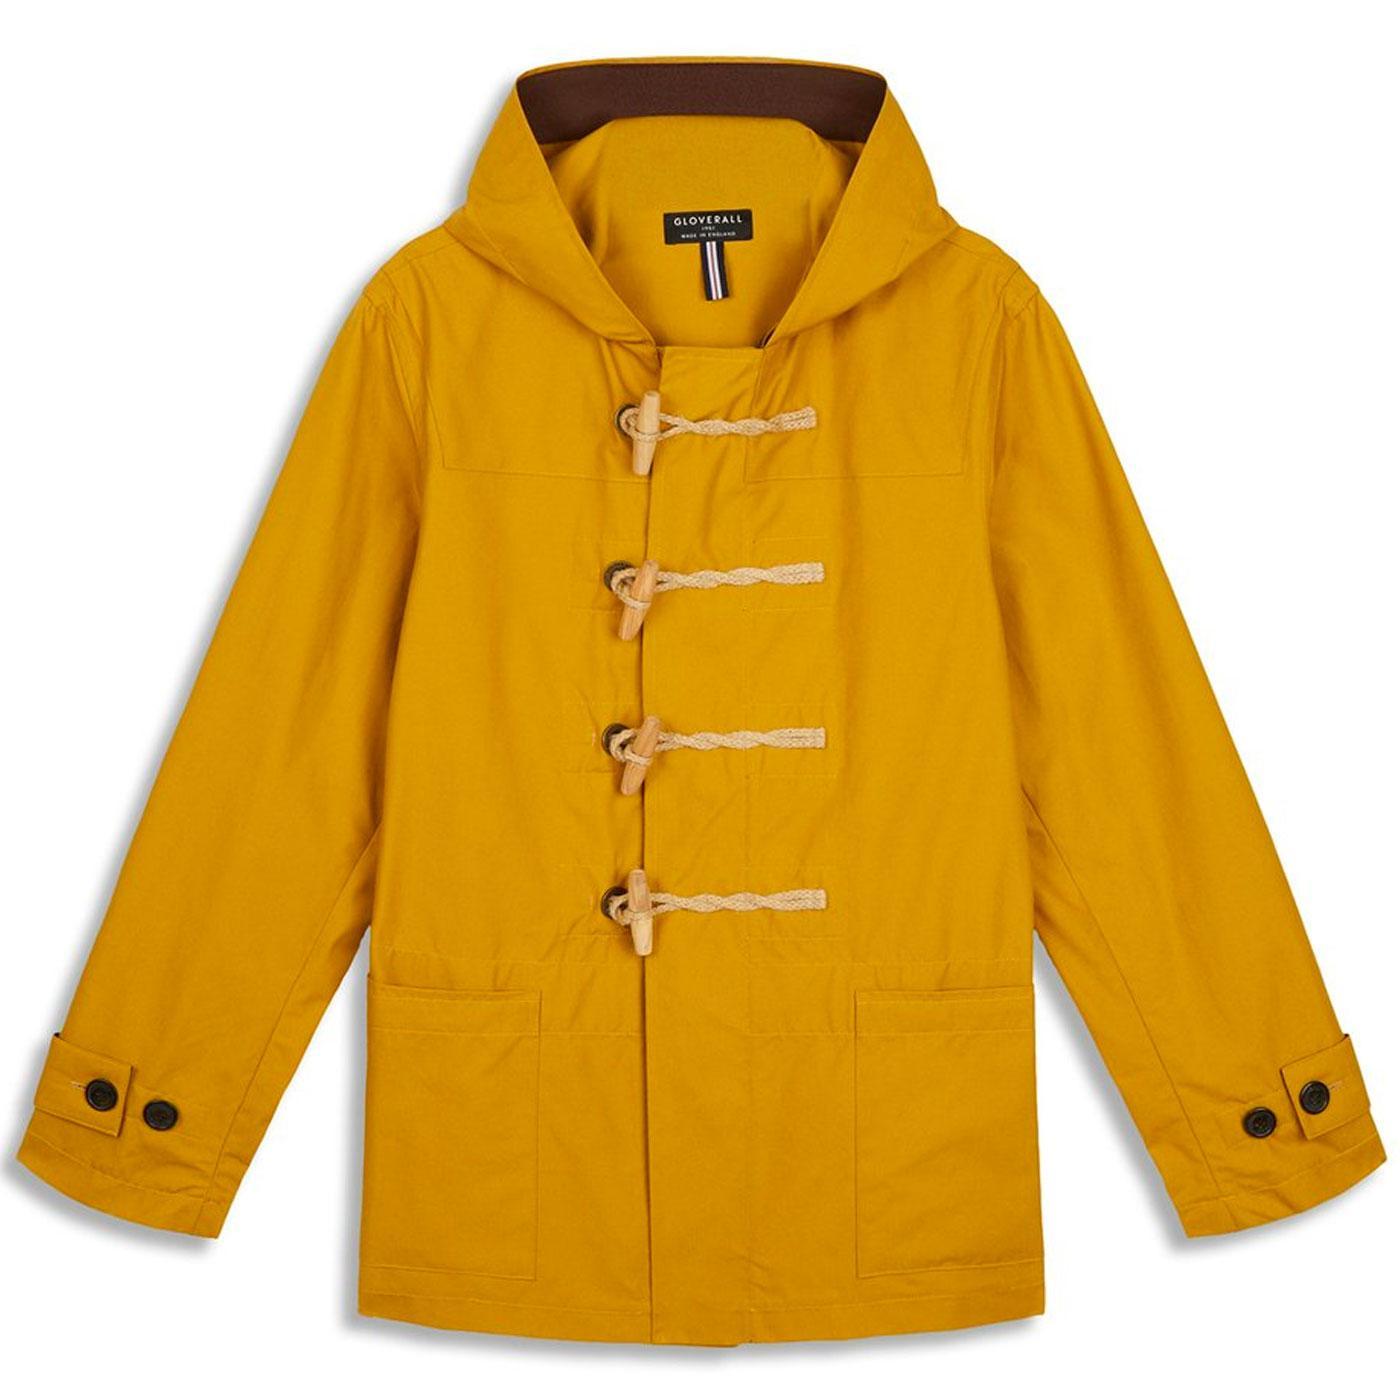 Mid Monty GLOVERALL Mod Summer Duffle Coat MUSTARD